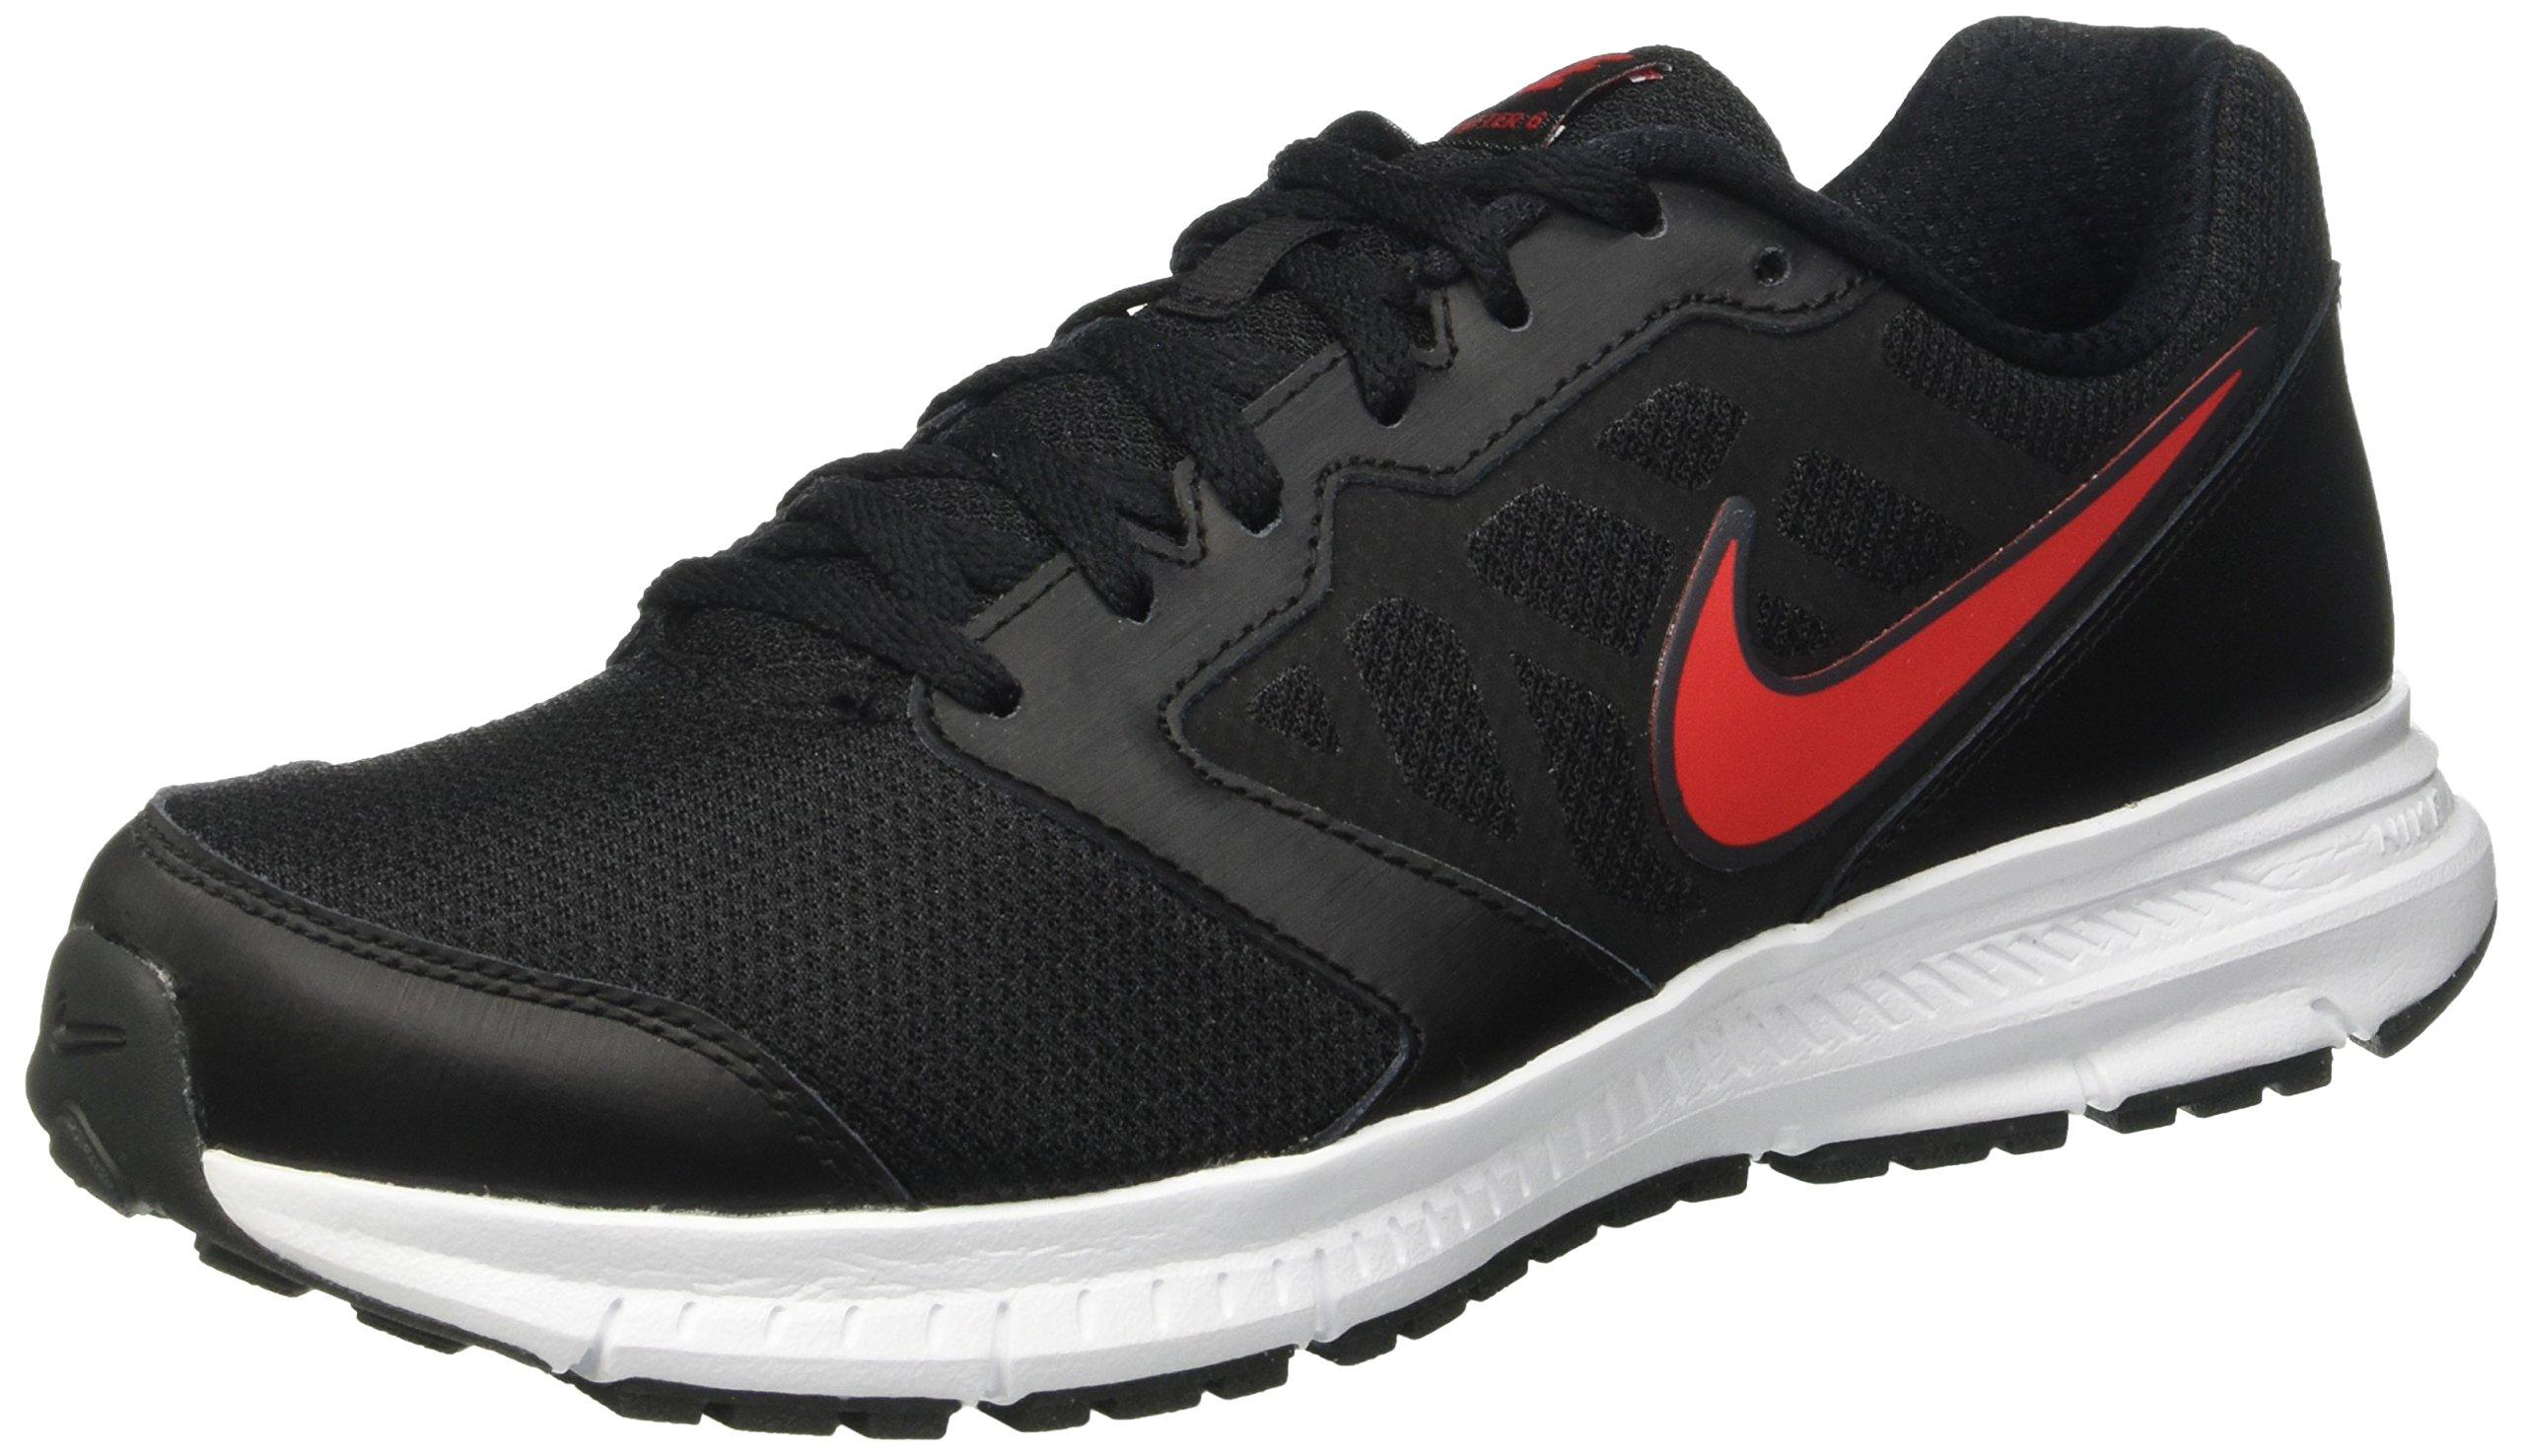 wholesale dealer 37472 84b97 Galleon - Nike Men s Downshifter 6 Black University Red Anthracite White Running  Shoe 11 Men US